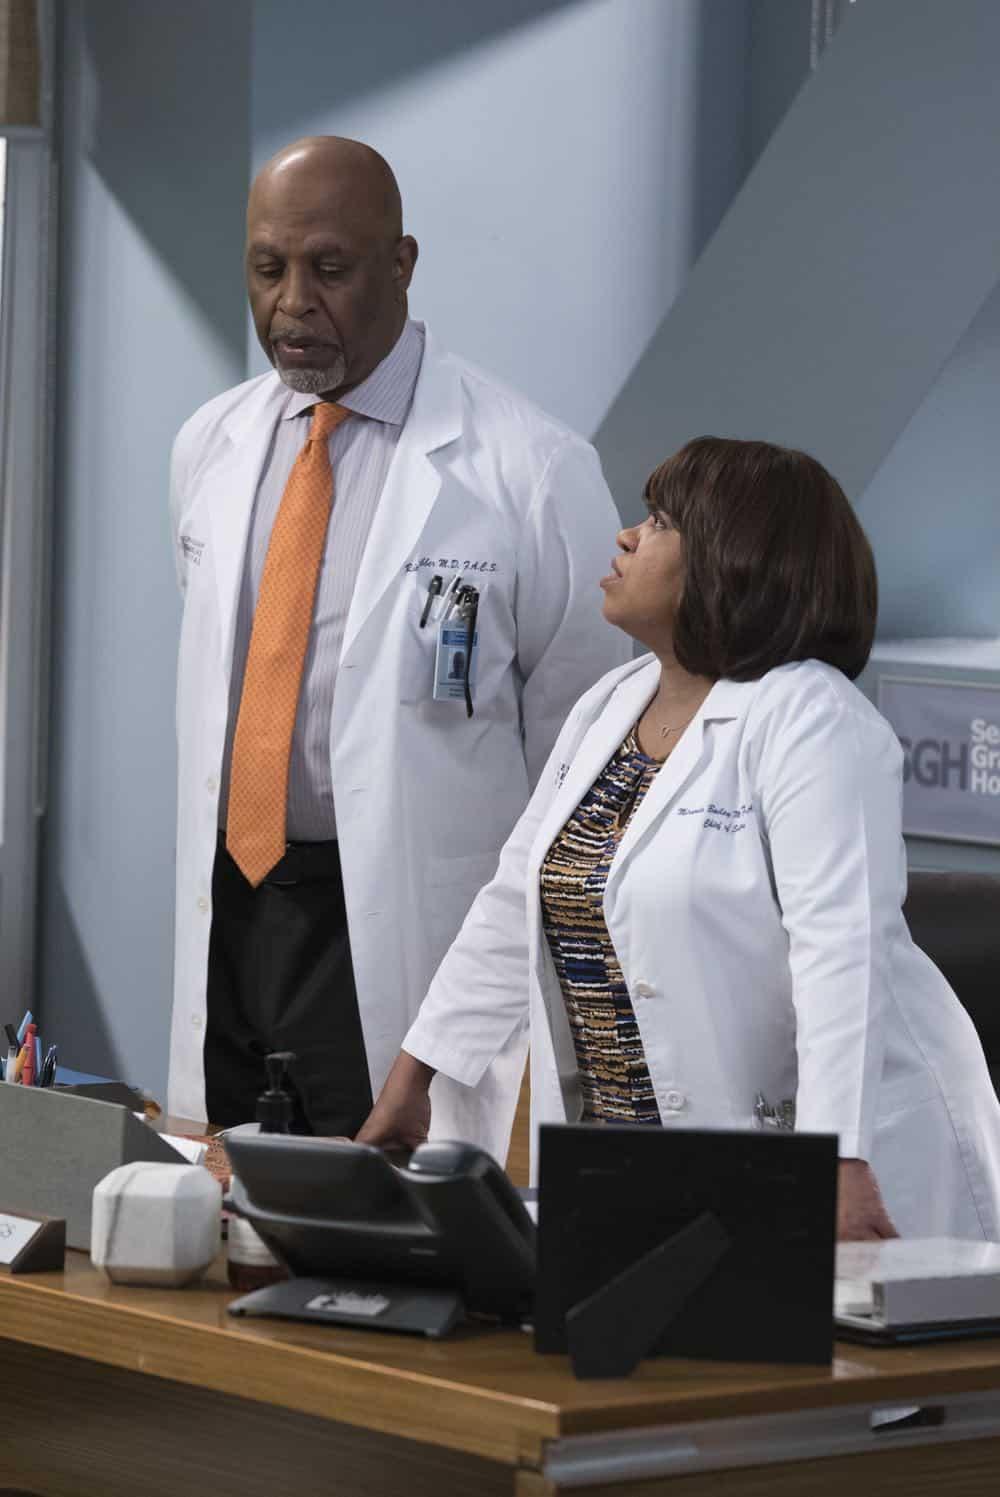 Greys Anatomy Episode 21 Season 14 Bad Reputation 21